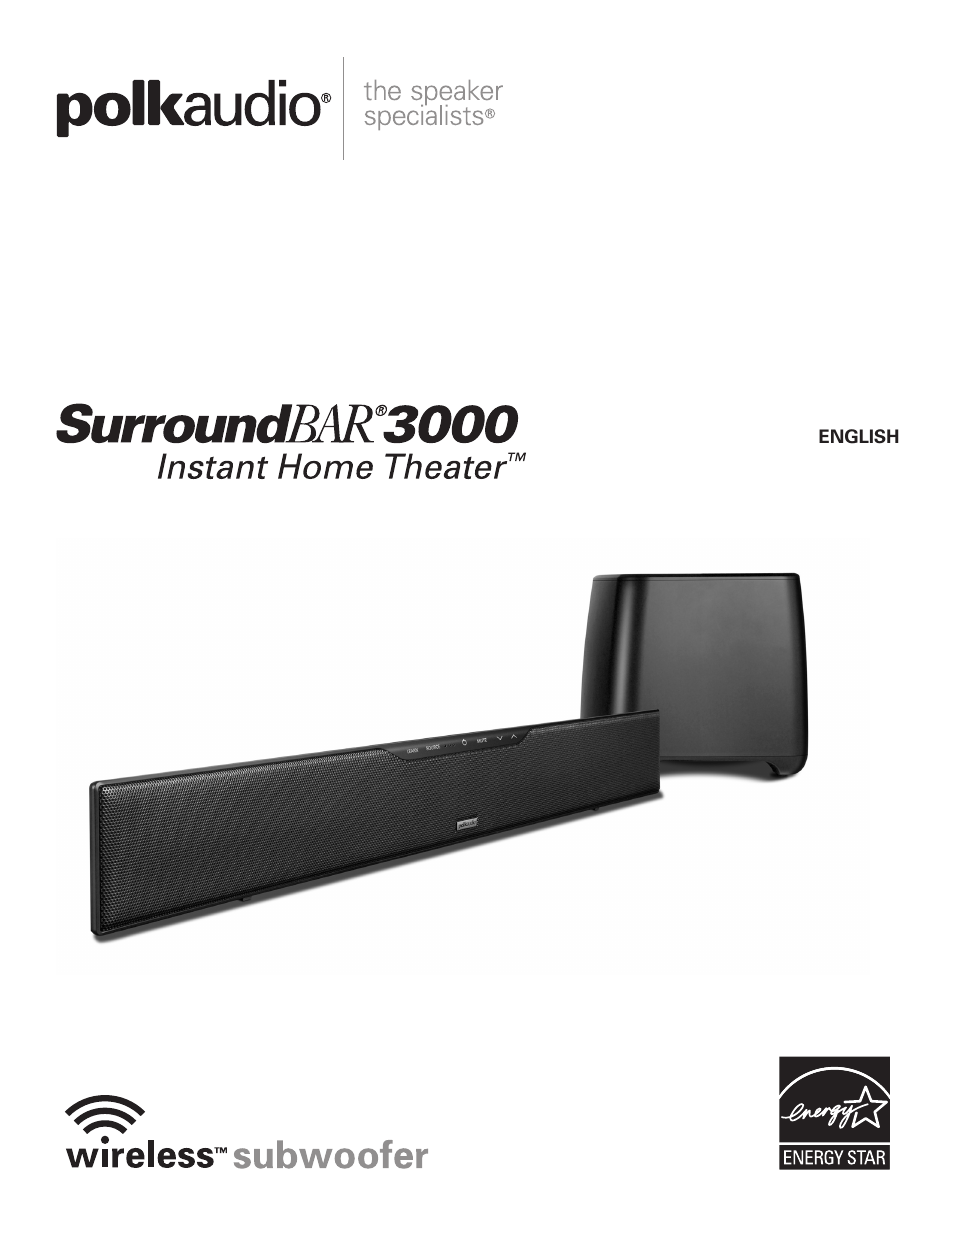 polk audio surroundbar 3000 user manual 12 pages rh manualsdir com polk audio surroundbar manual polk audio iht digital one step soundbar manual